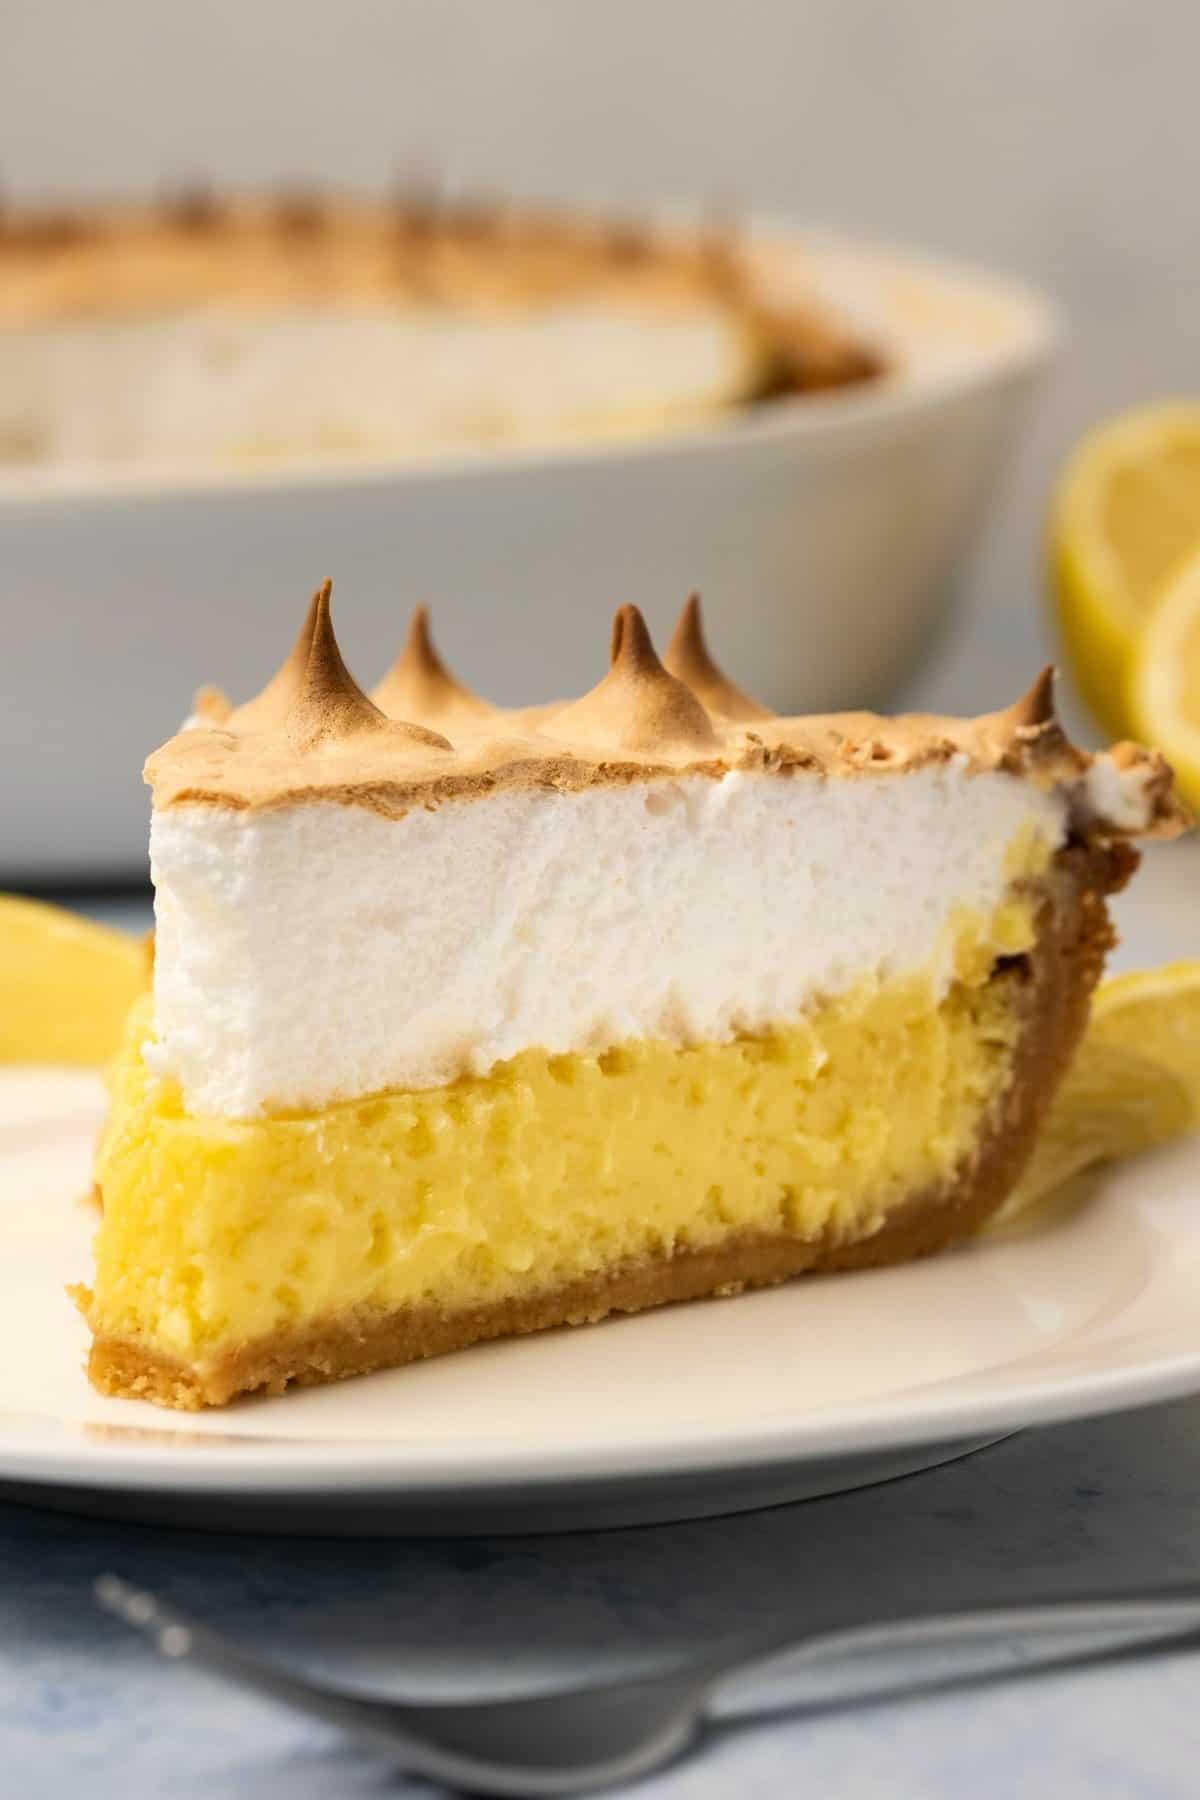 Slice of lemon meringue pie on a white plate.